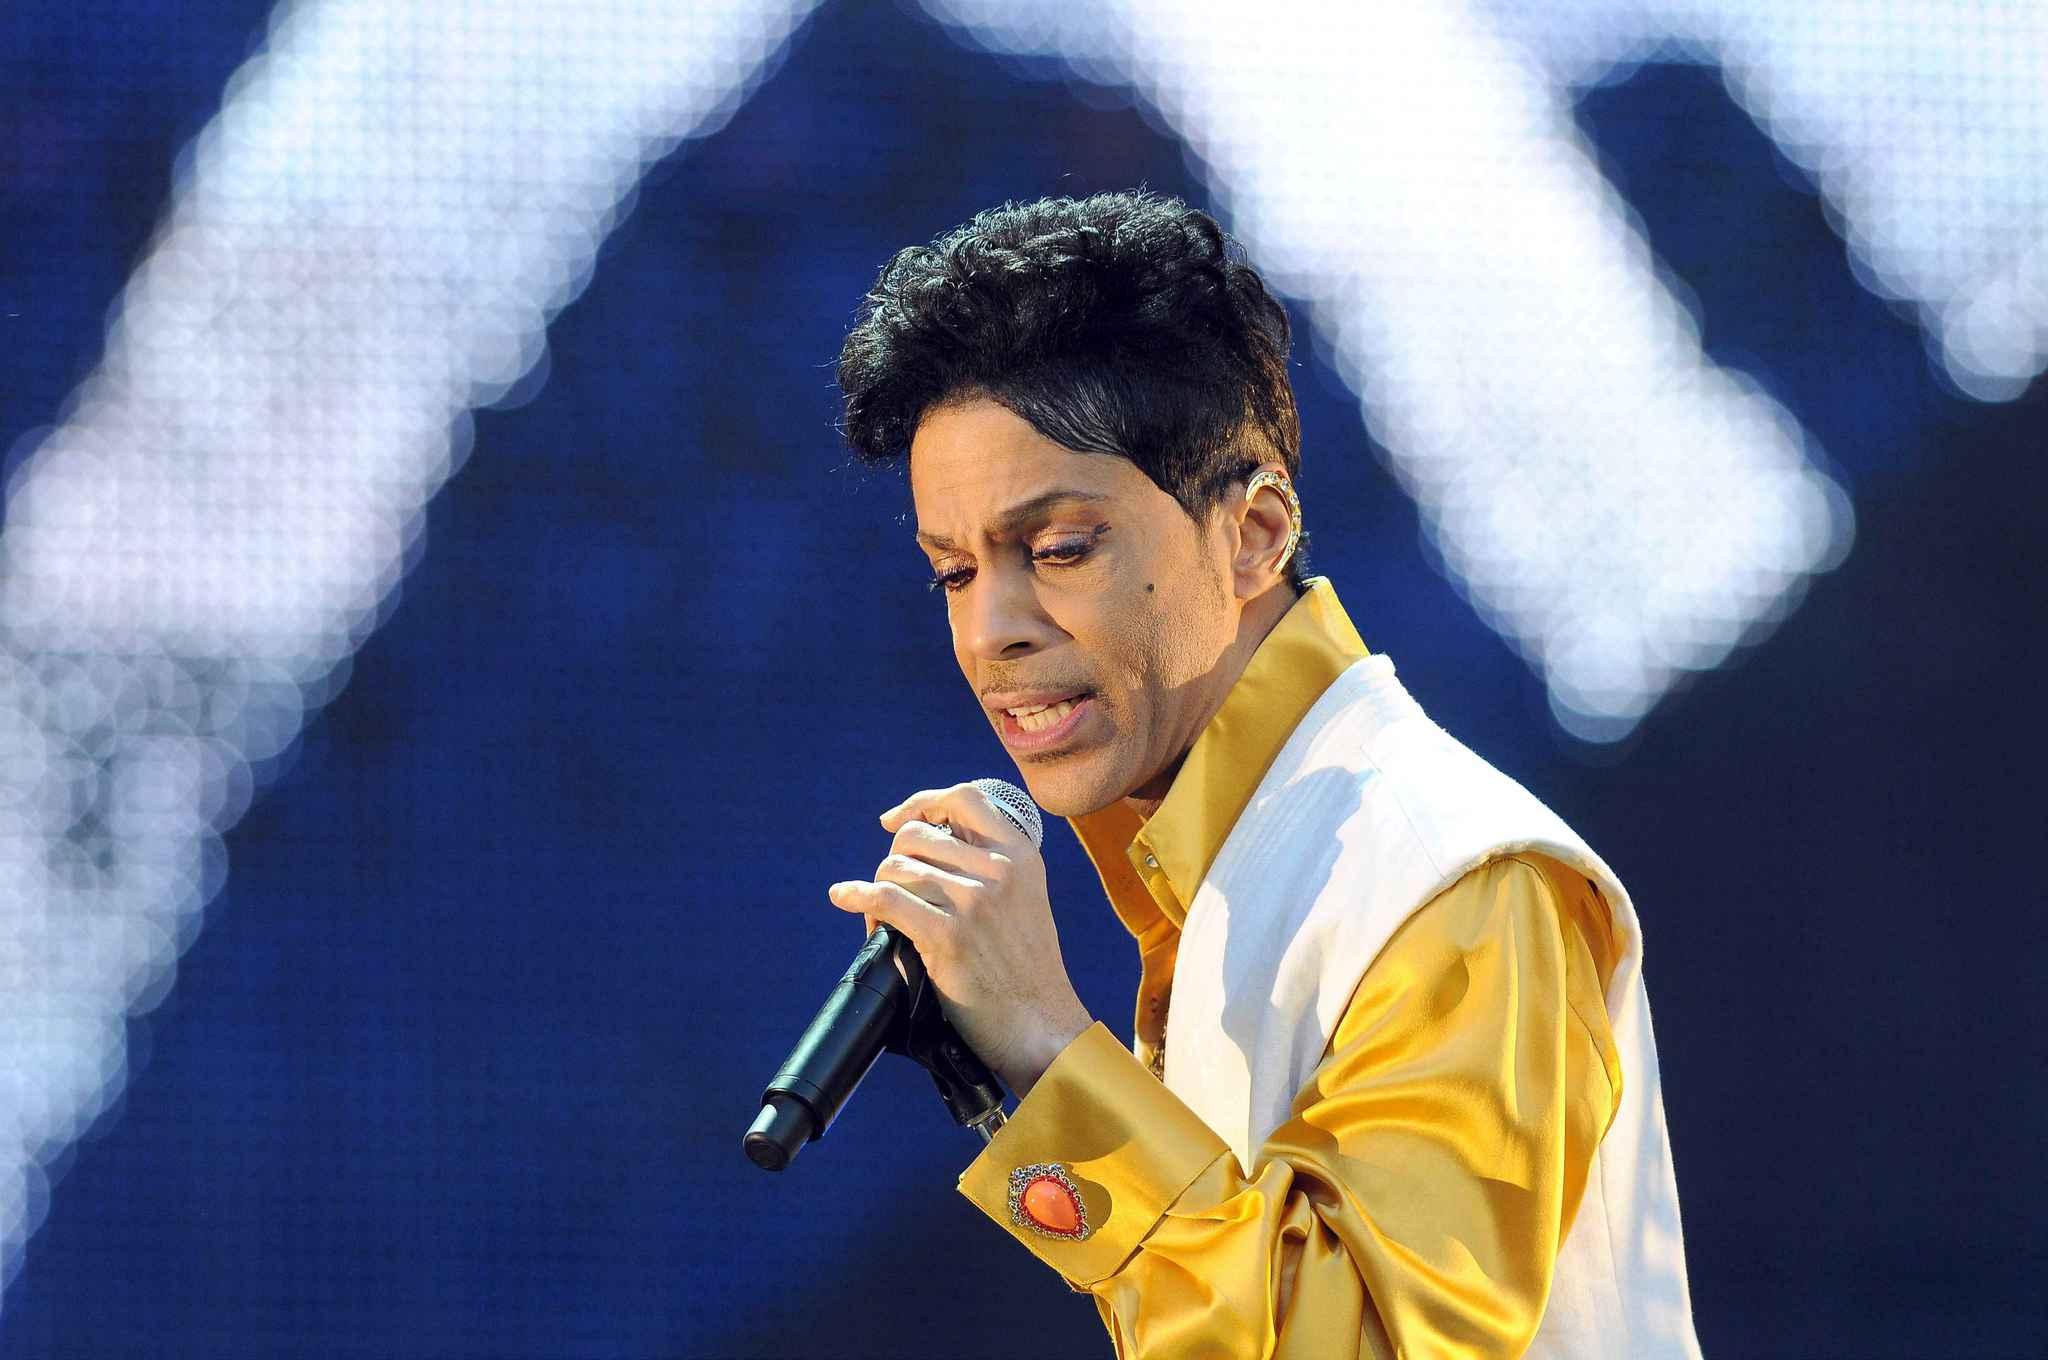 2048x1536-fit_prince-concert-stade-france-paris-30-juin-2011.jpg